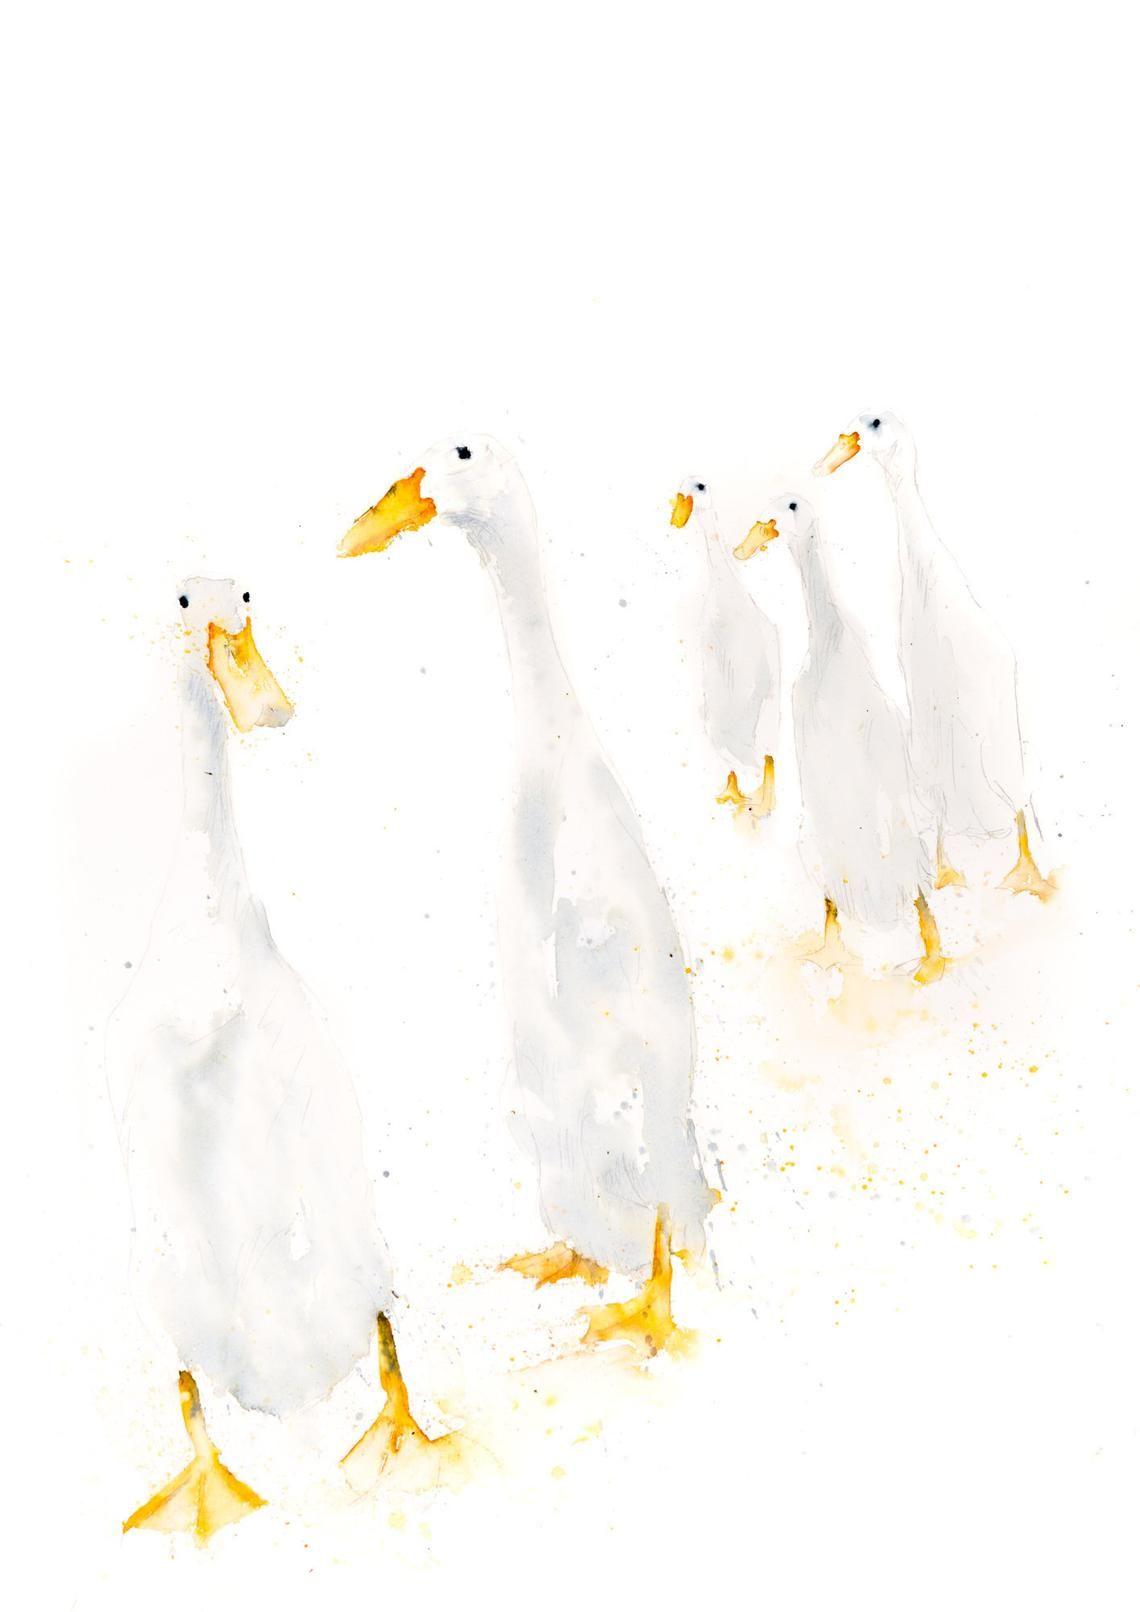 Runner Ducks Standing Wall Art Signed Print Of The Original Etsy